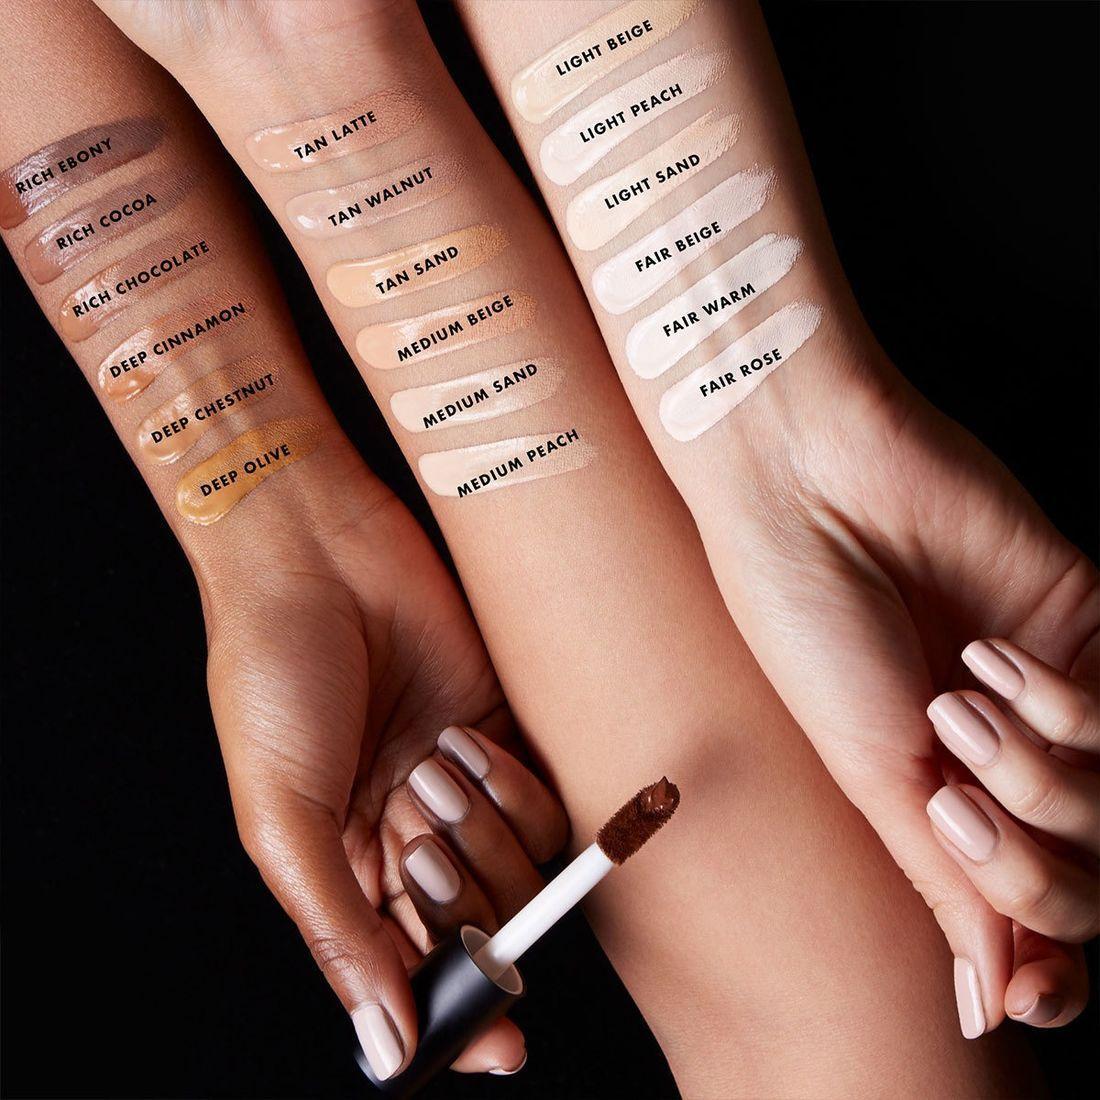 Beauty Blender Or Brush For Full Coverage: Concealer, Contouring, Highlighting